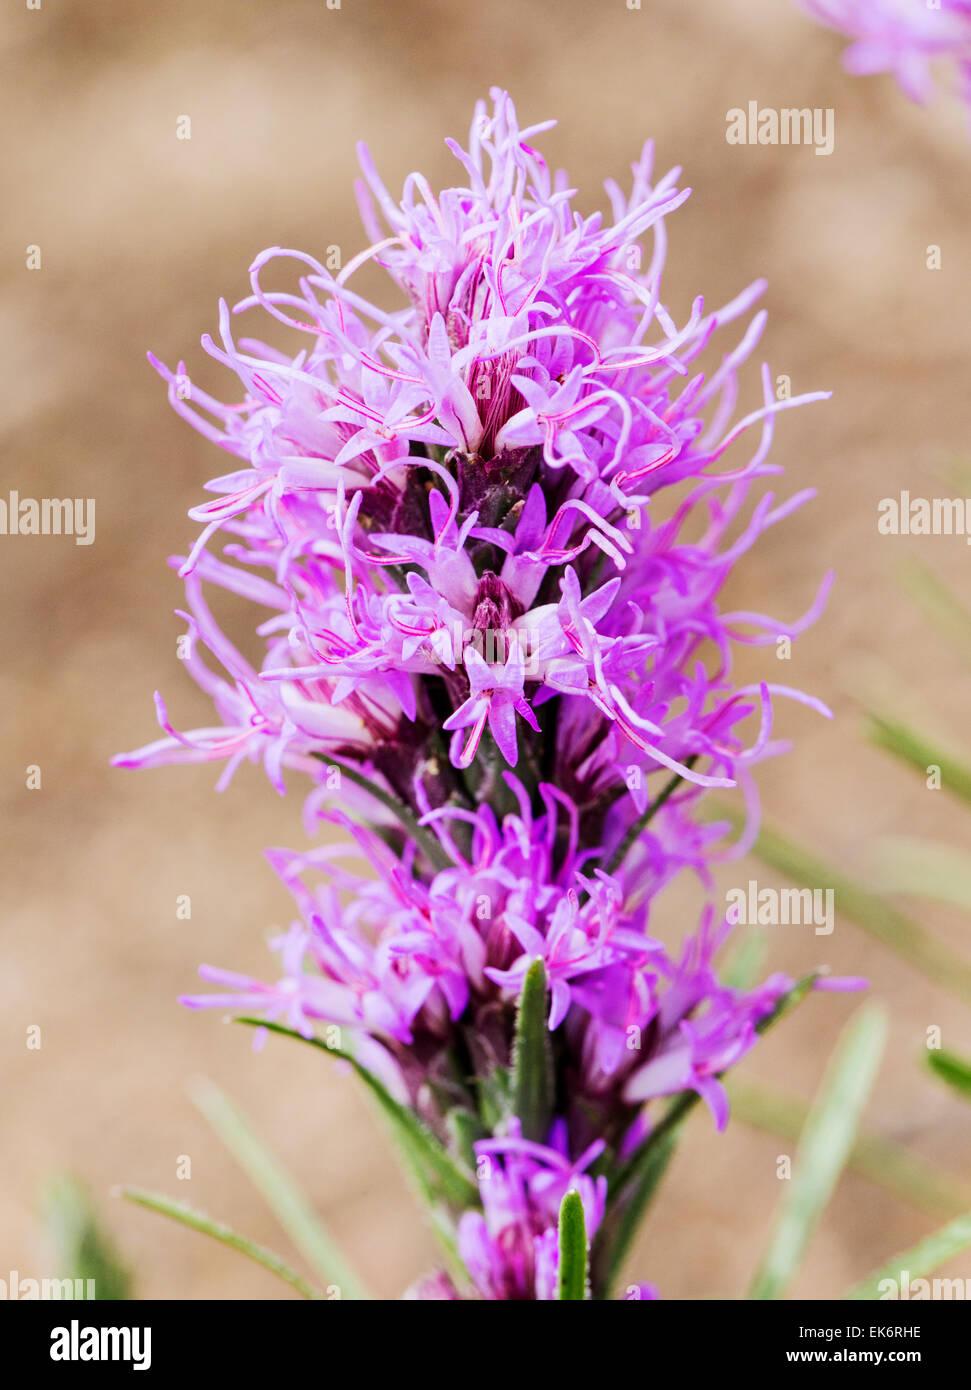 Gayfeather Prairie Blazingstar, Kansas, Liatris pycnostachya en fleur, fleurs sauvages, le centre du Colorado, USA Photo Stock